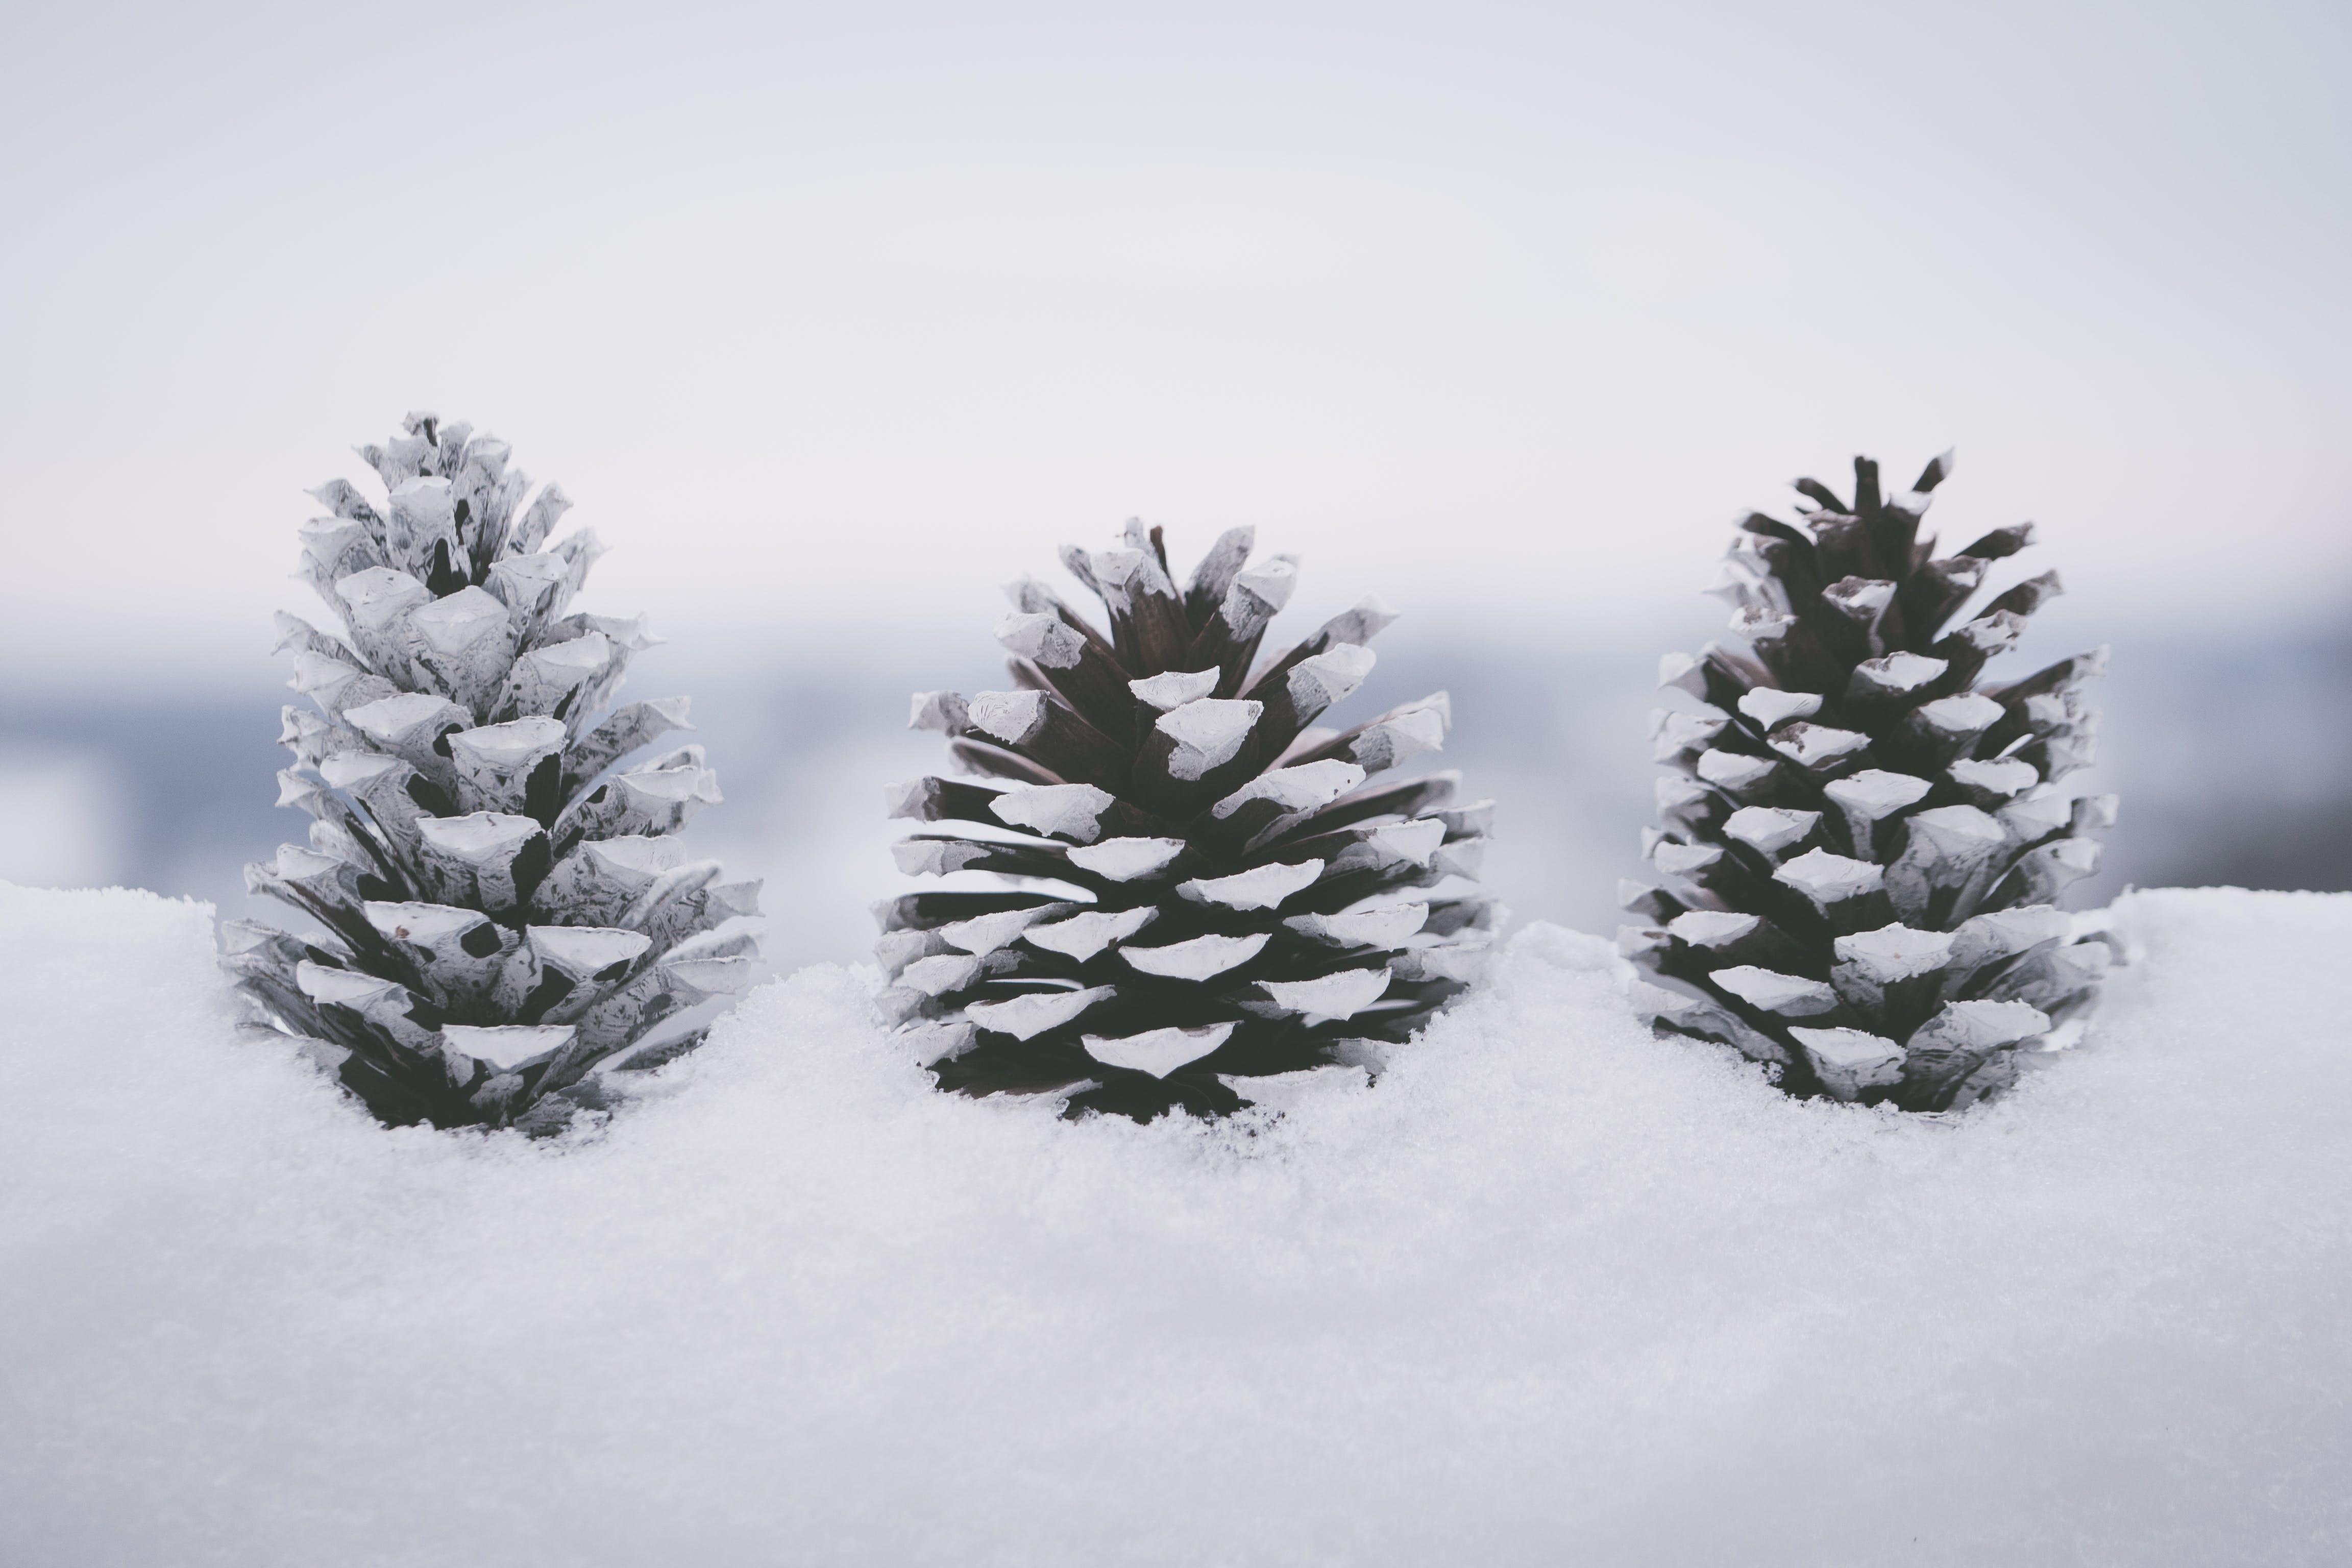 Snow Covered Pine Cones